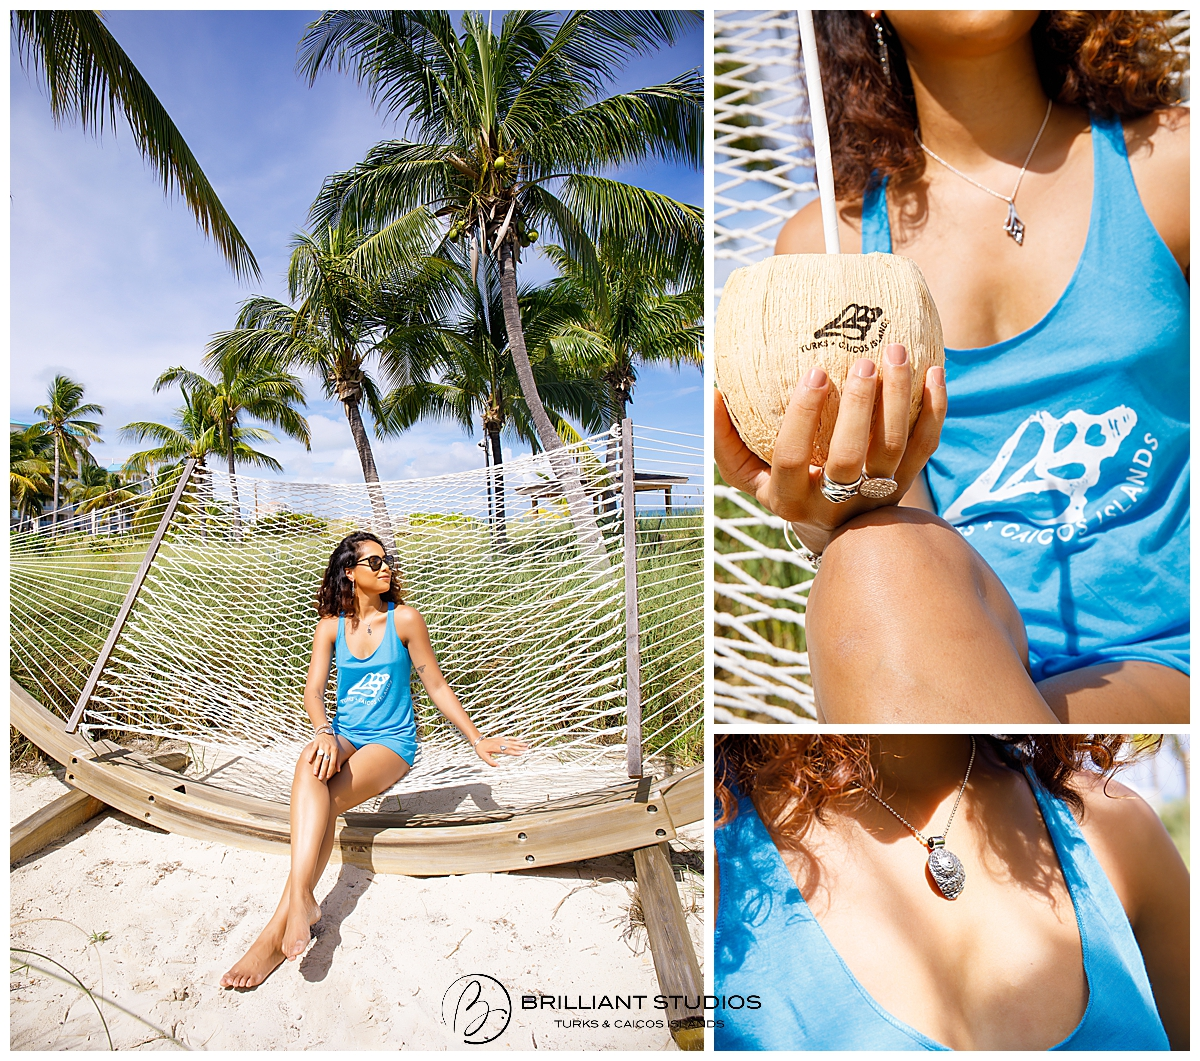 Ocean Club West photography